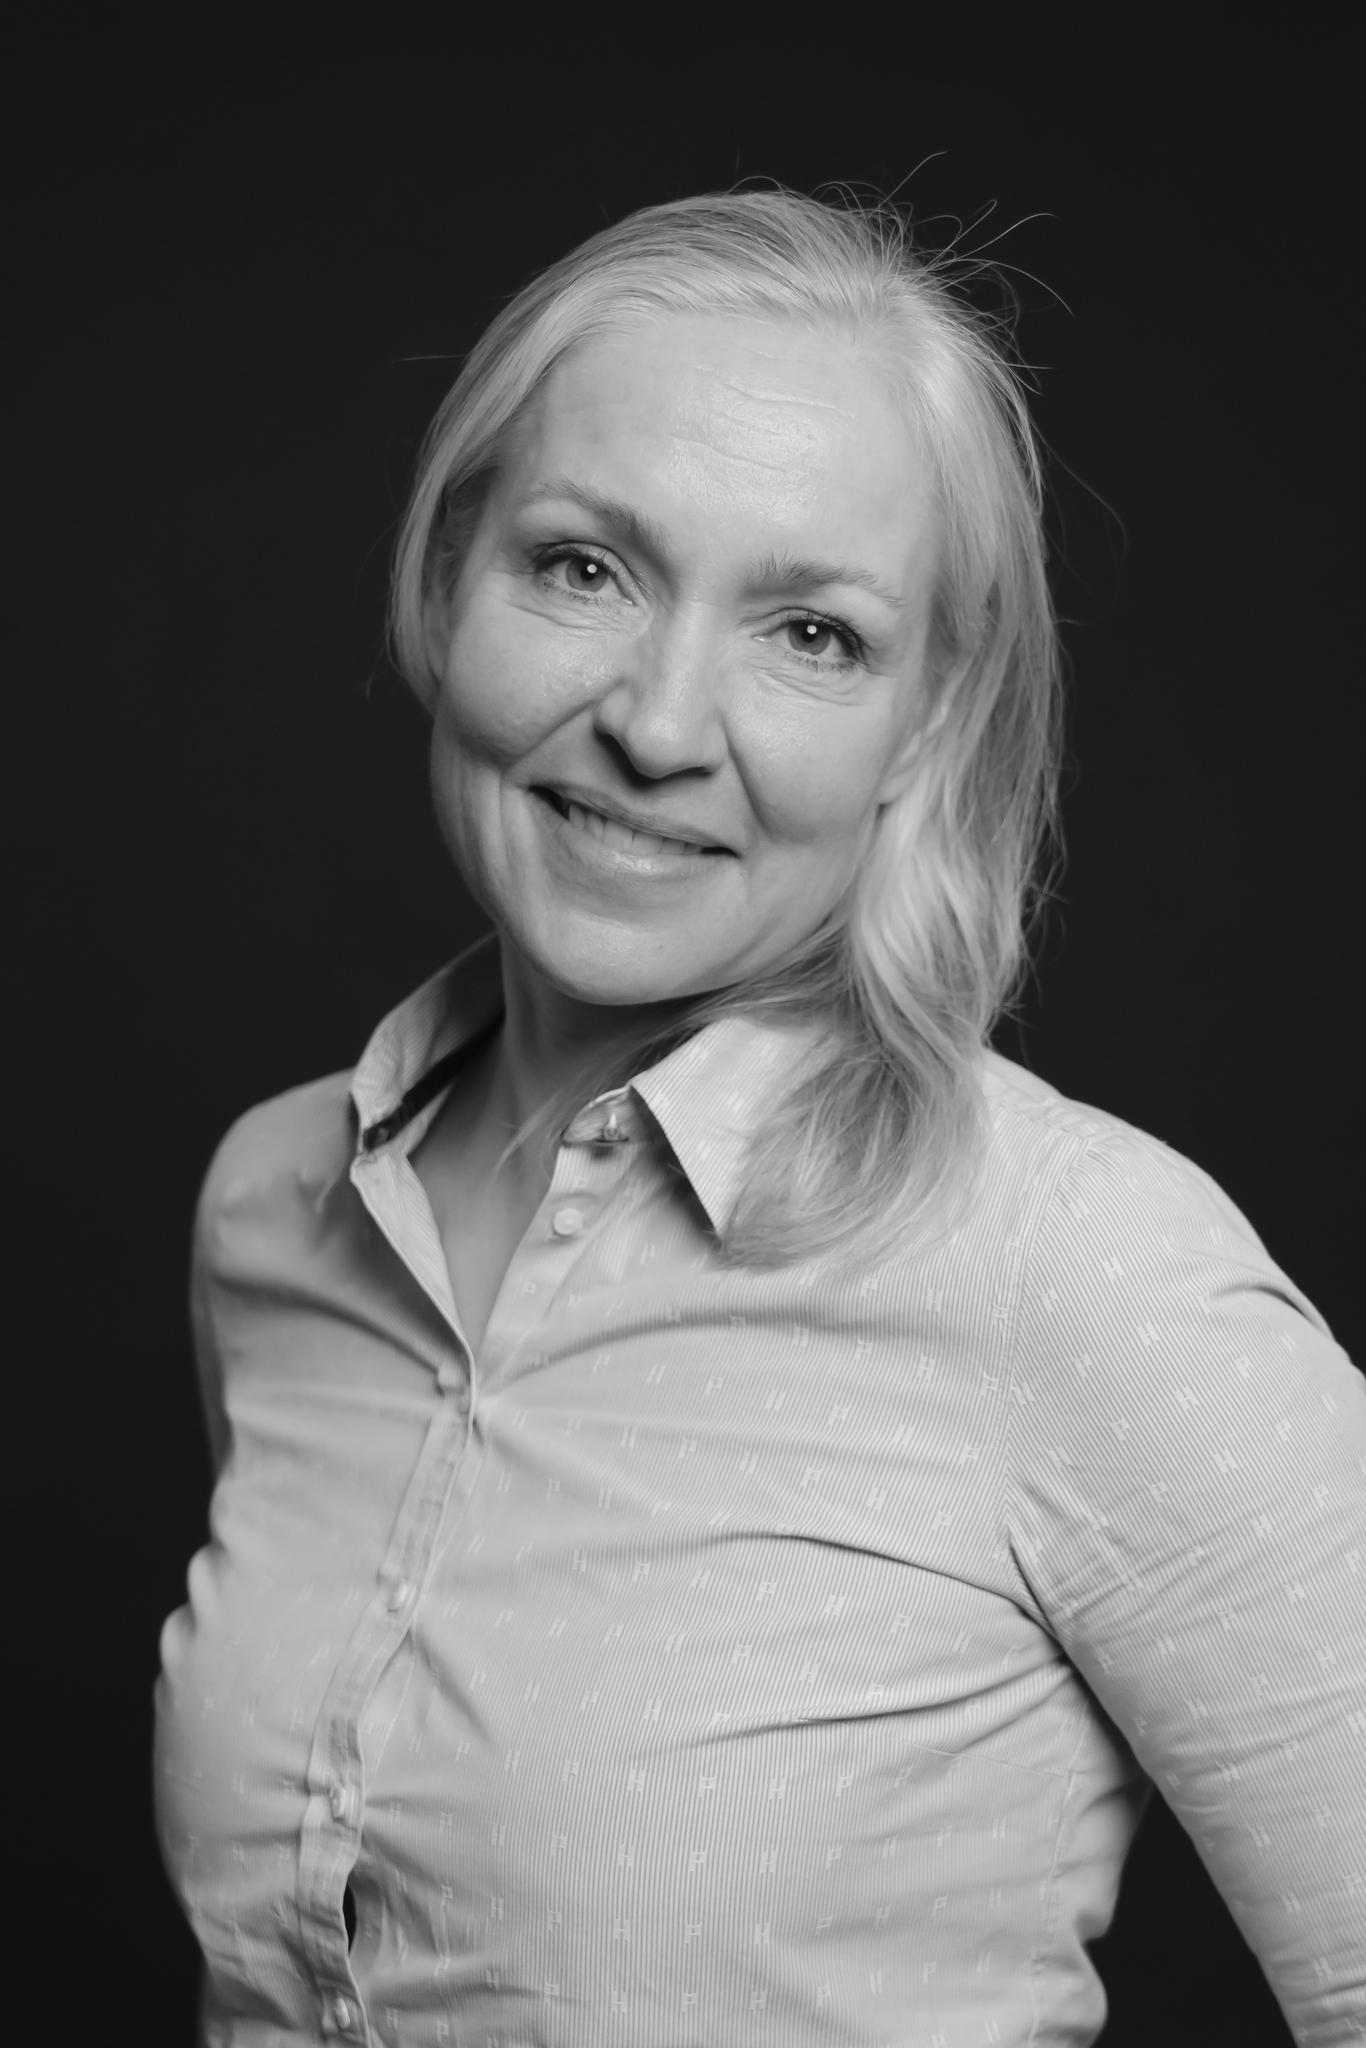 Lena Midtveit image 1